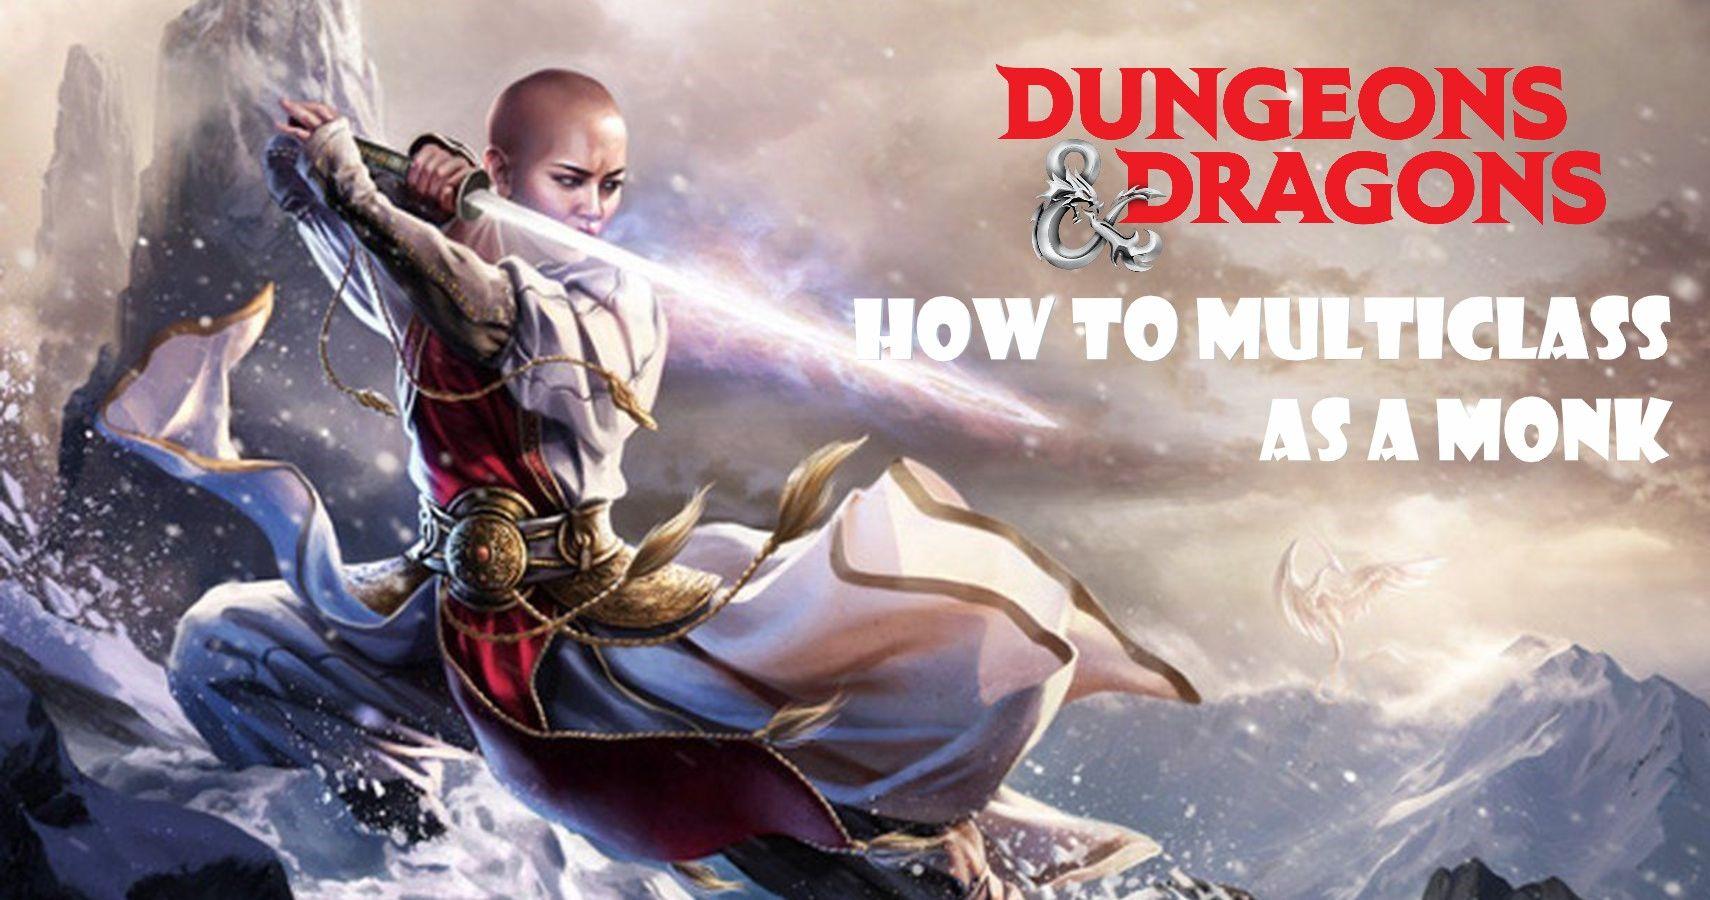 Dungeons & Dragons: cómo ser un monje en múltiples clases